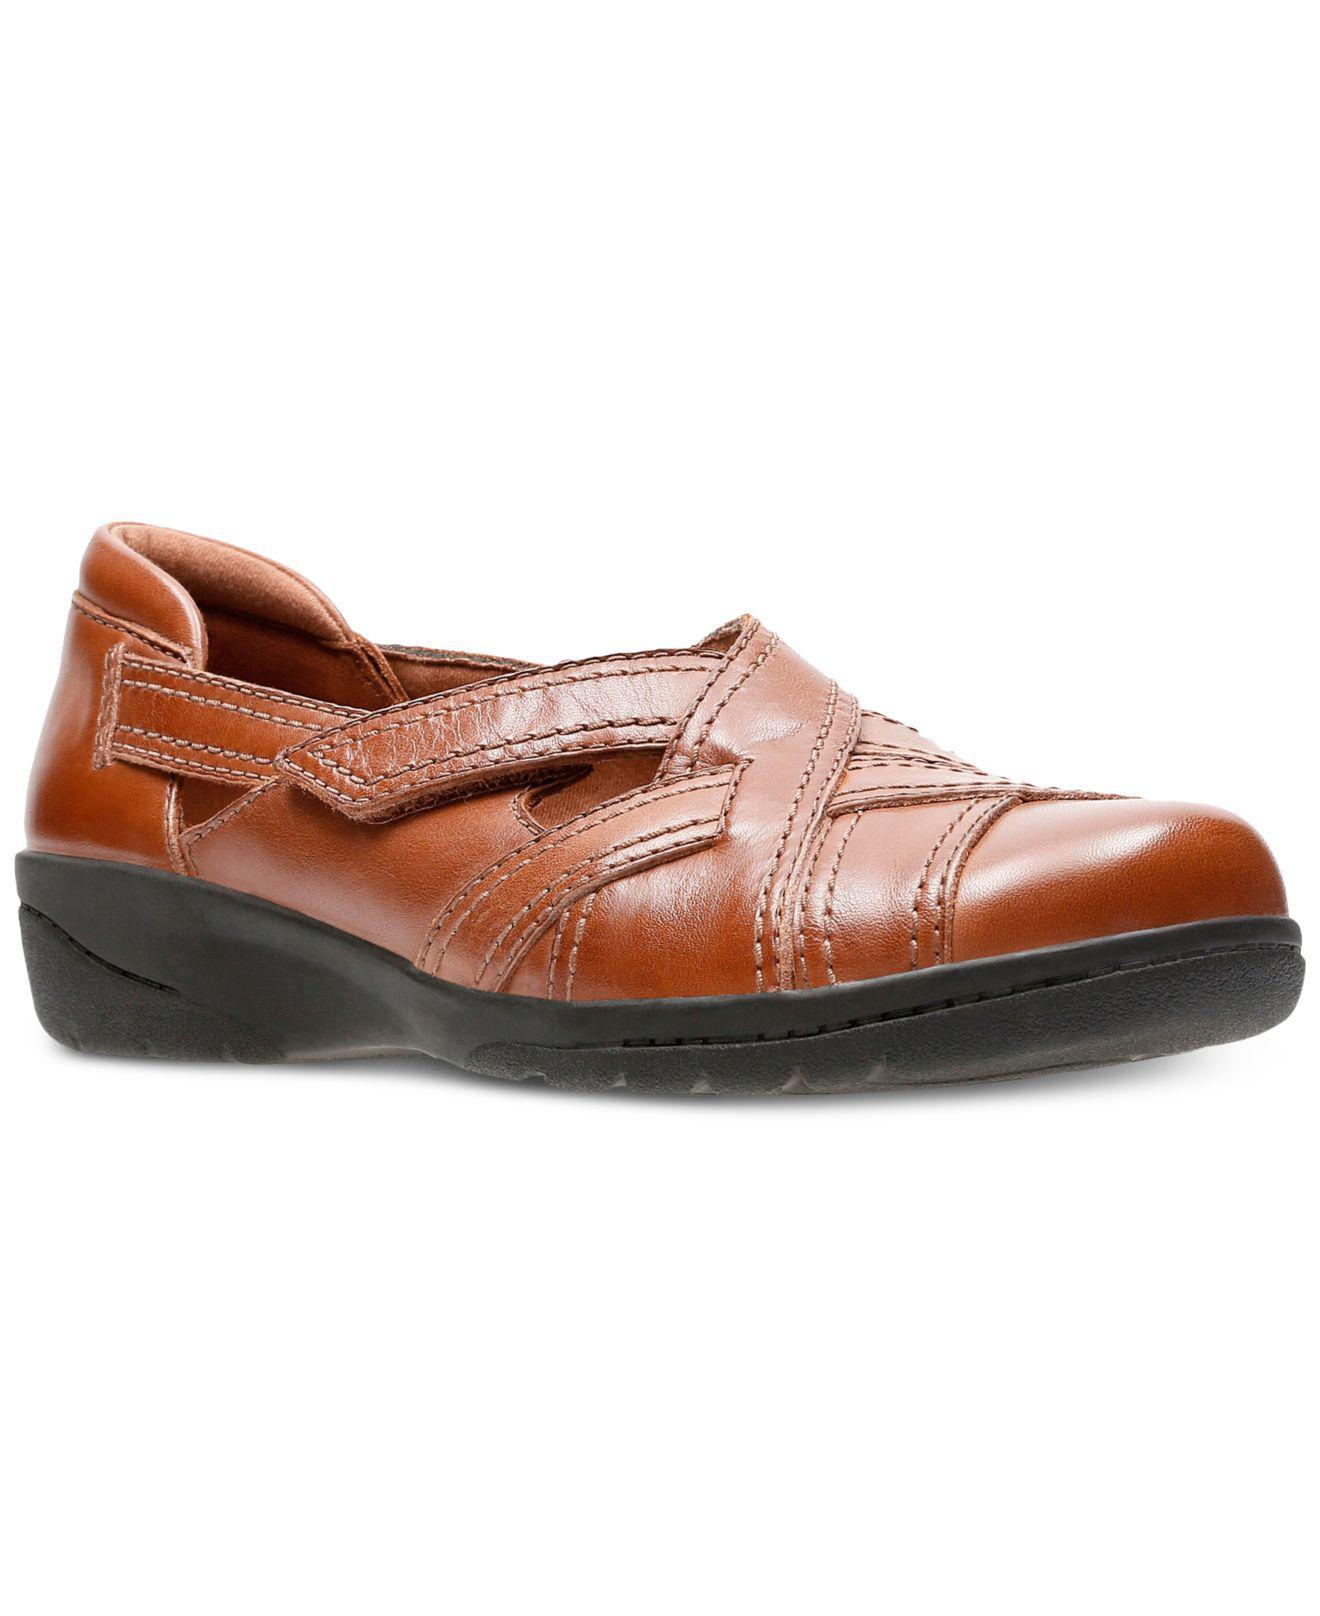 Clarks Collection Women's Cheyn Madi Flats Women's Shoes bYihc